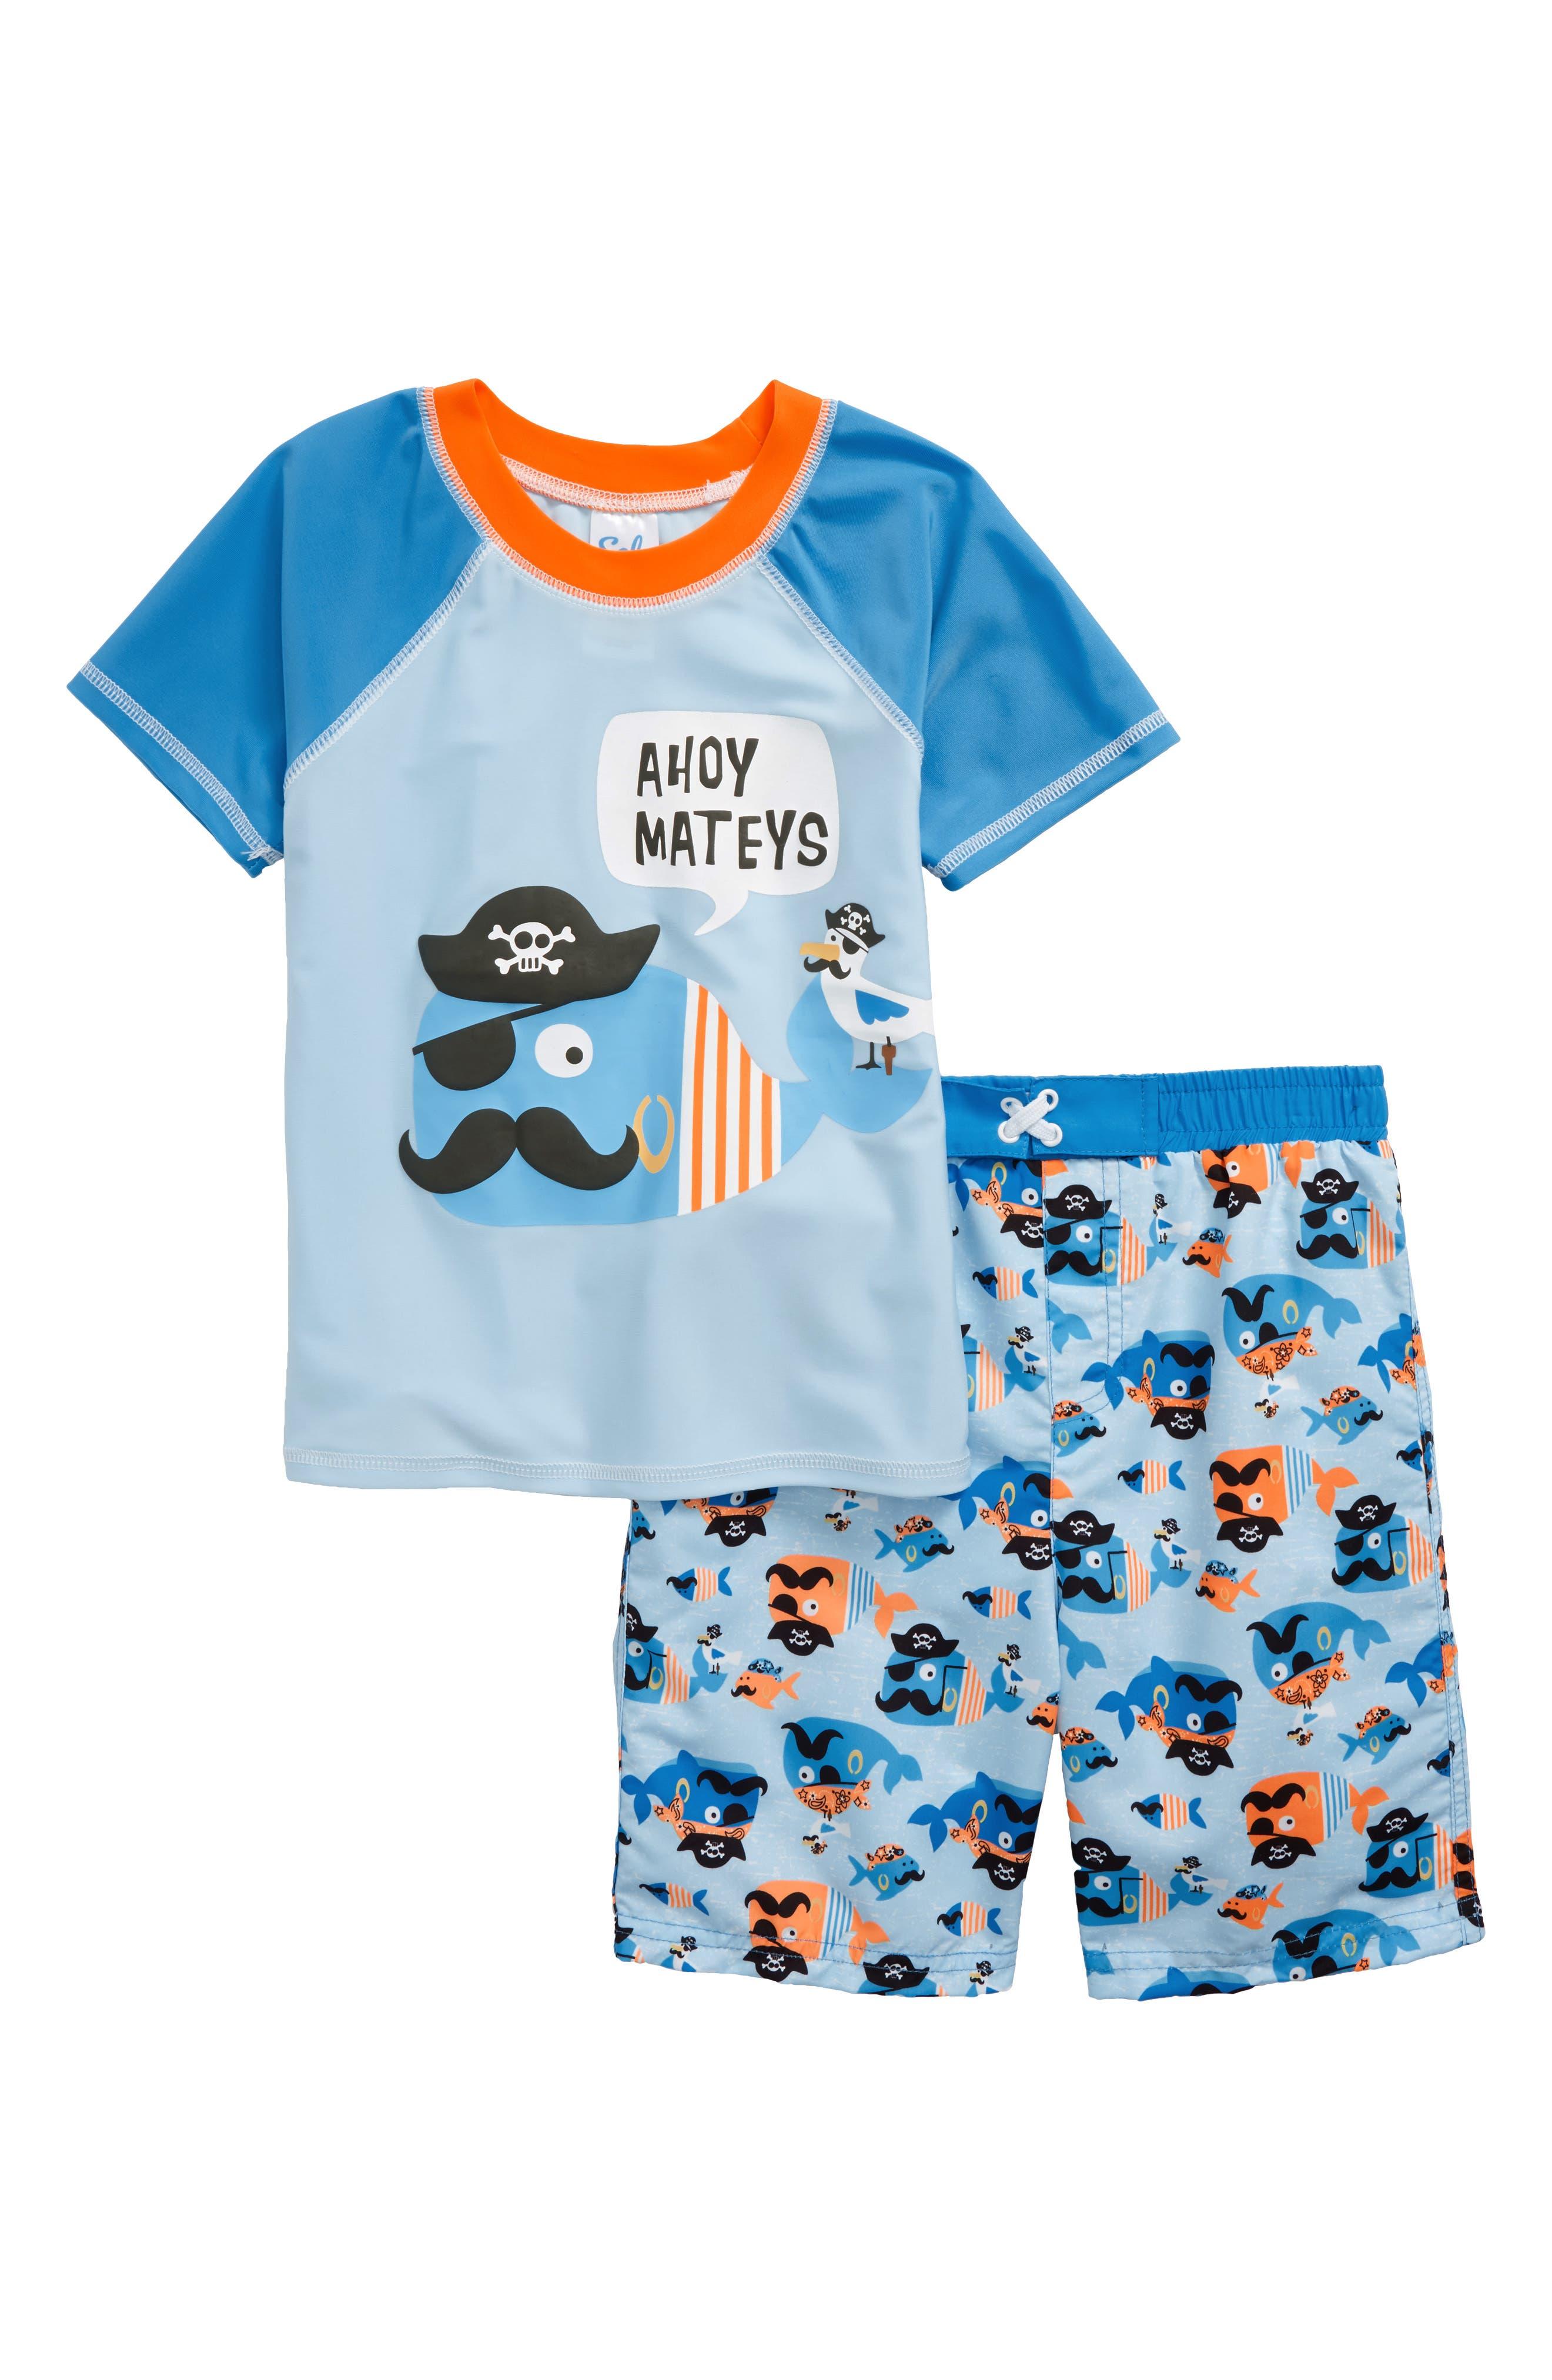 Sol Swim Ahoy Mateys Two-Piece Rashguard Swimsuit (Toddler Boys & Little Boys)